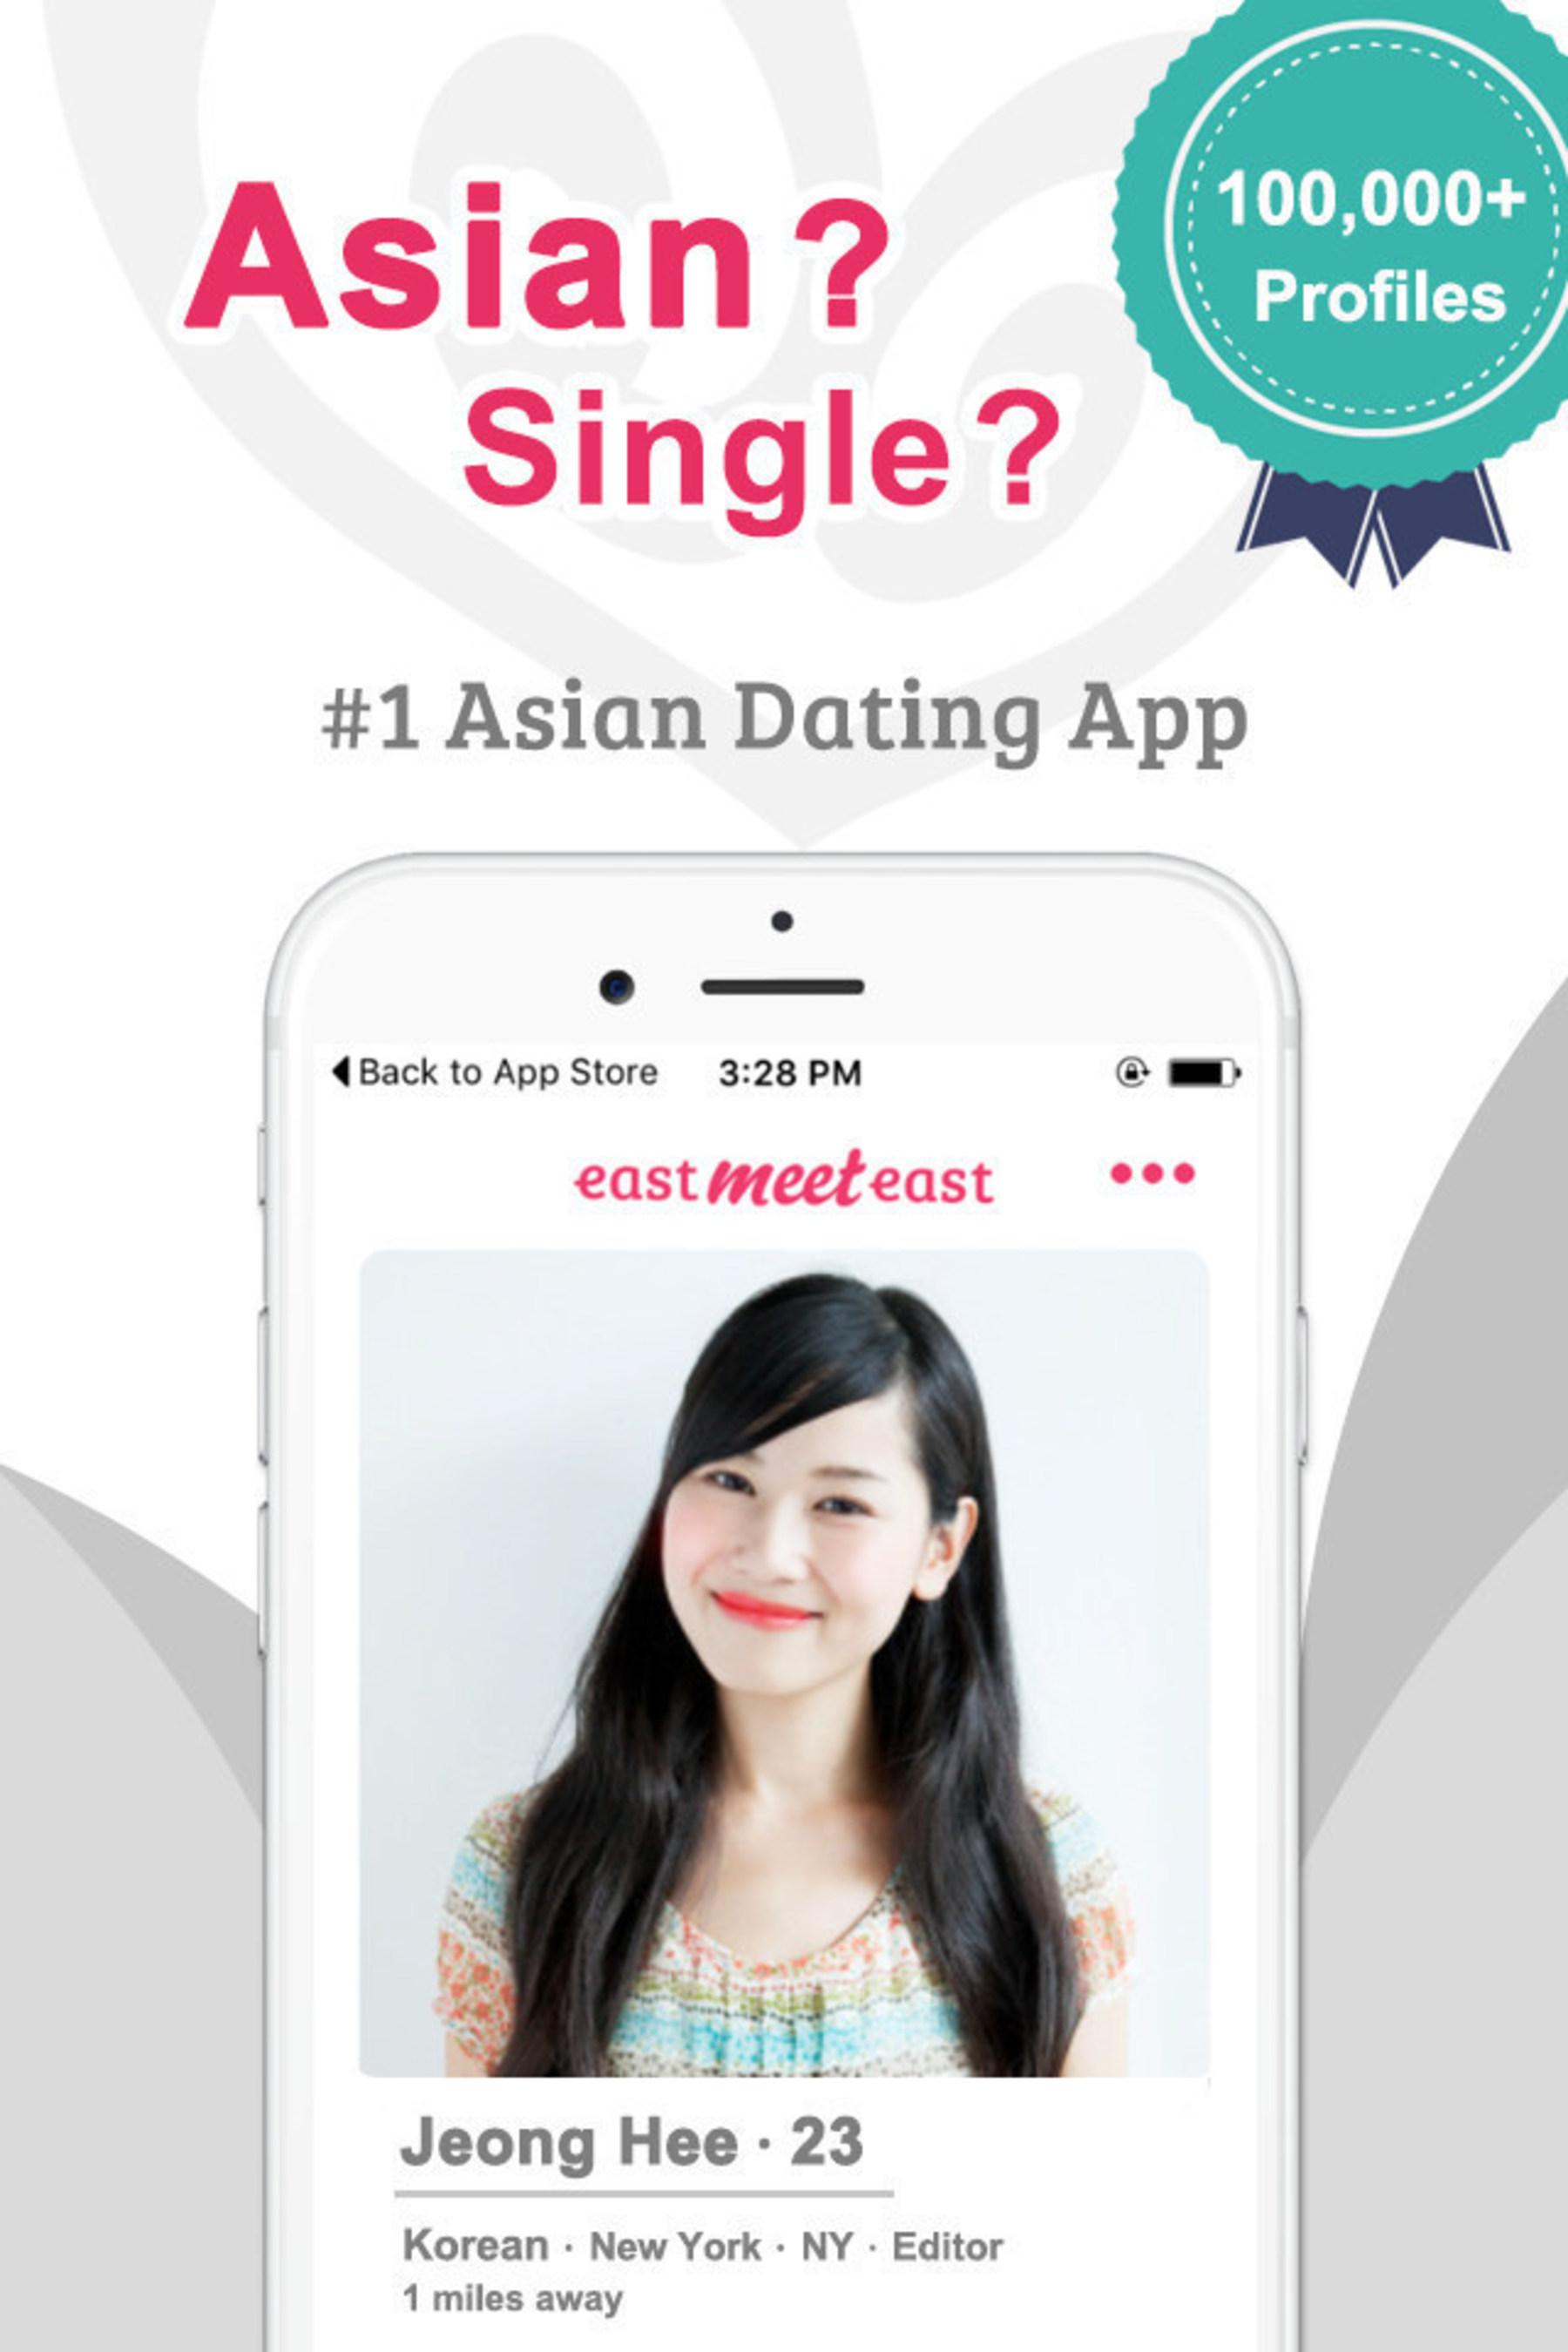 Asian dating website in new york